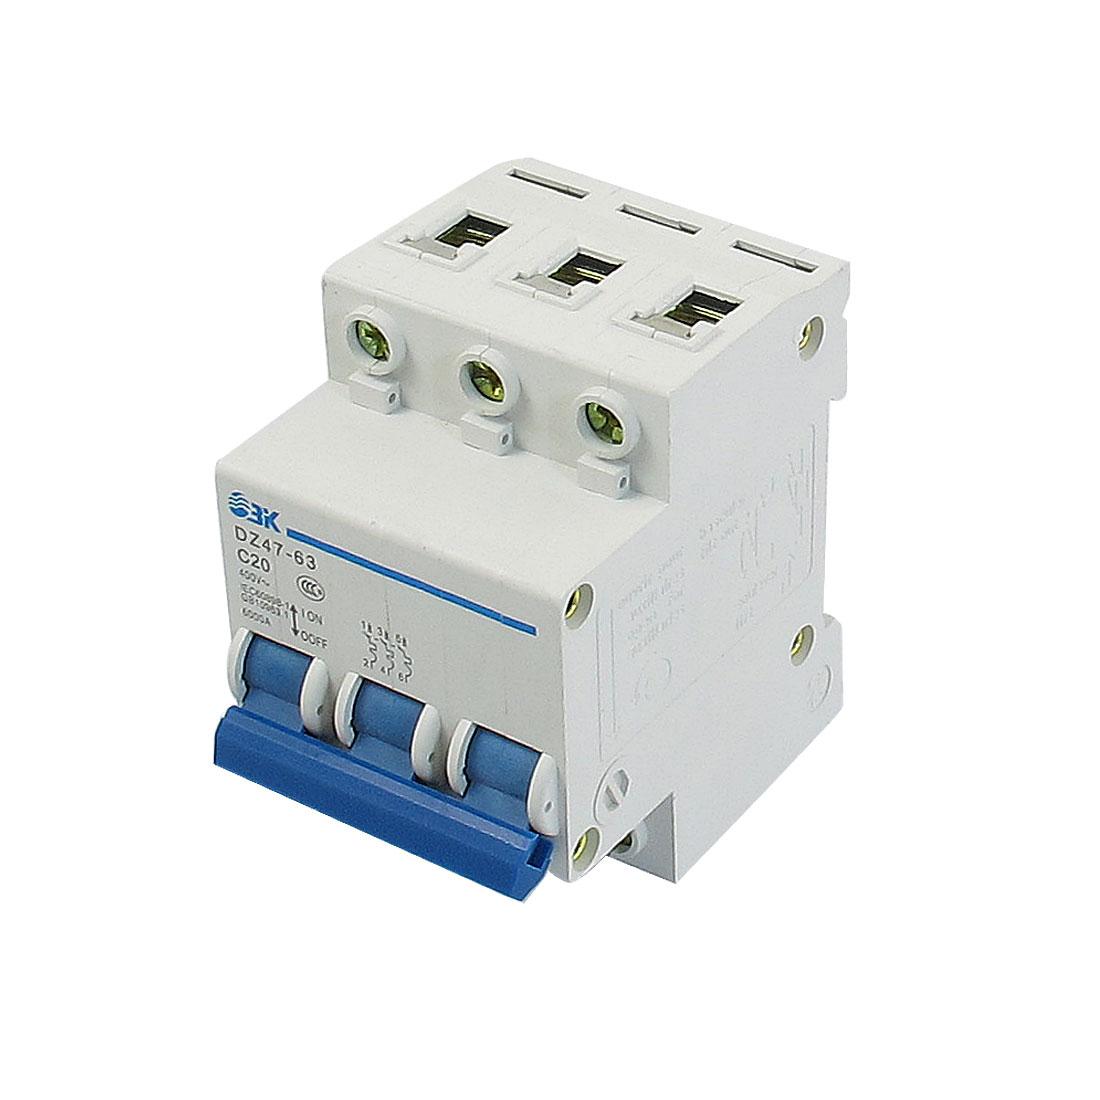 6000A Breaking Capacity DIN Rail 3P Electric Circuit Breaker AC 400V 20A